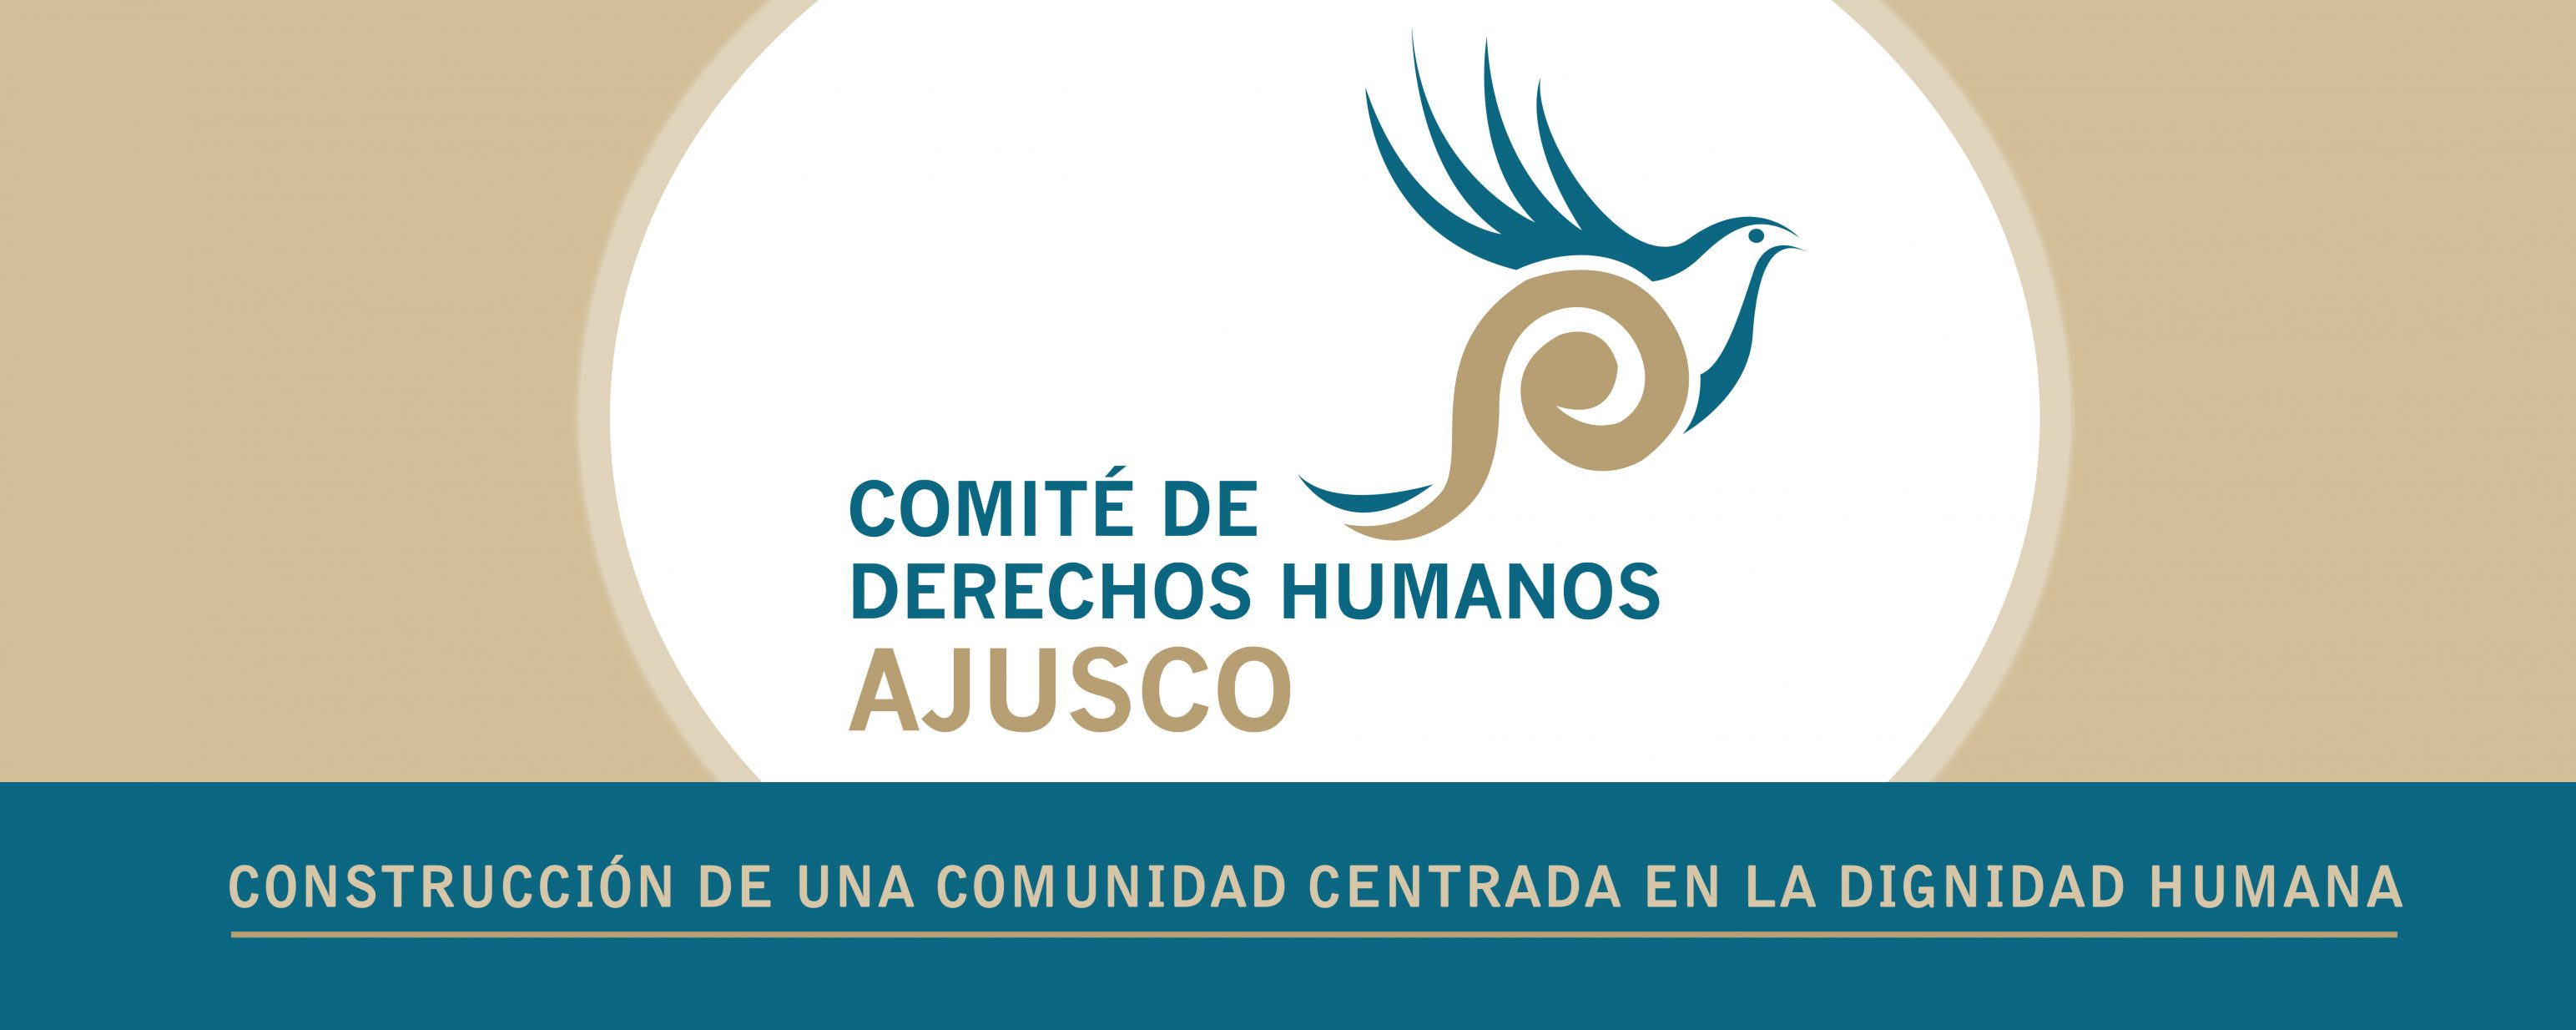 Comite de Derechos Humanos Ajusco